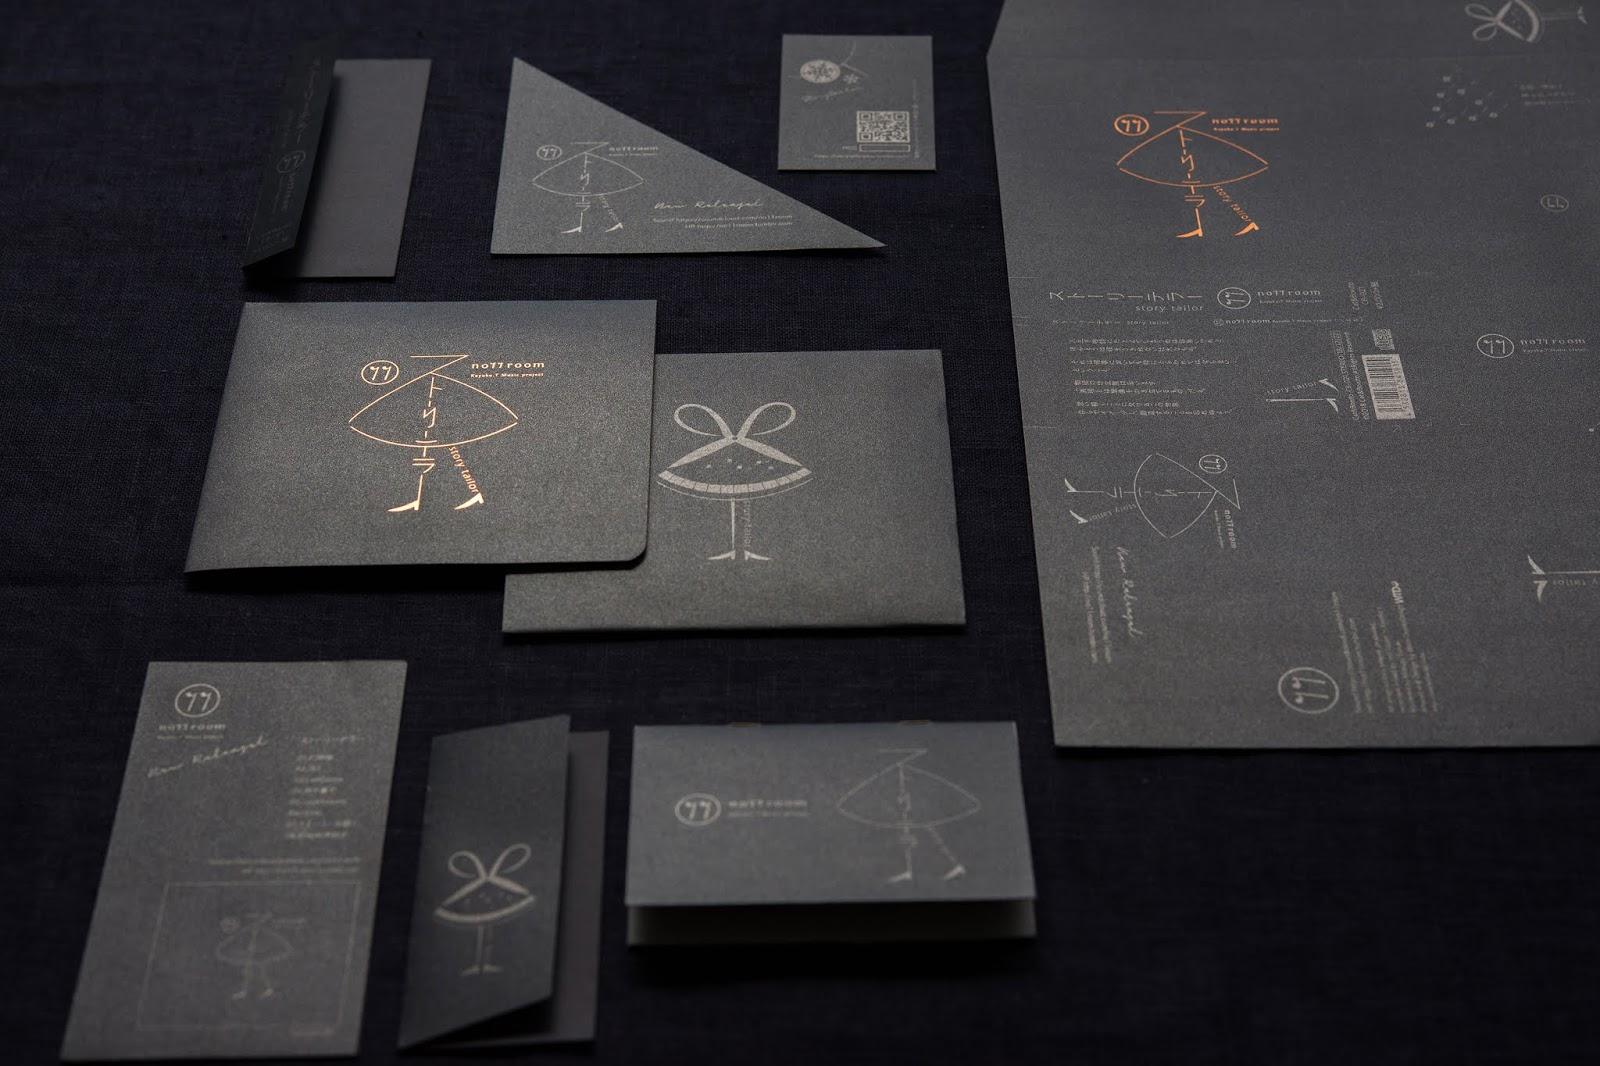 Story Tailor CD专辑封面设计